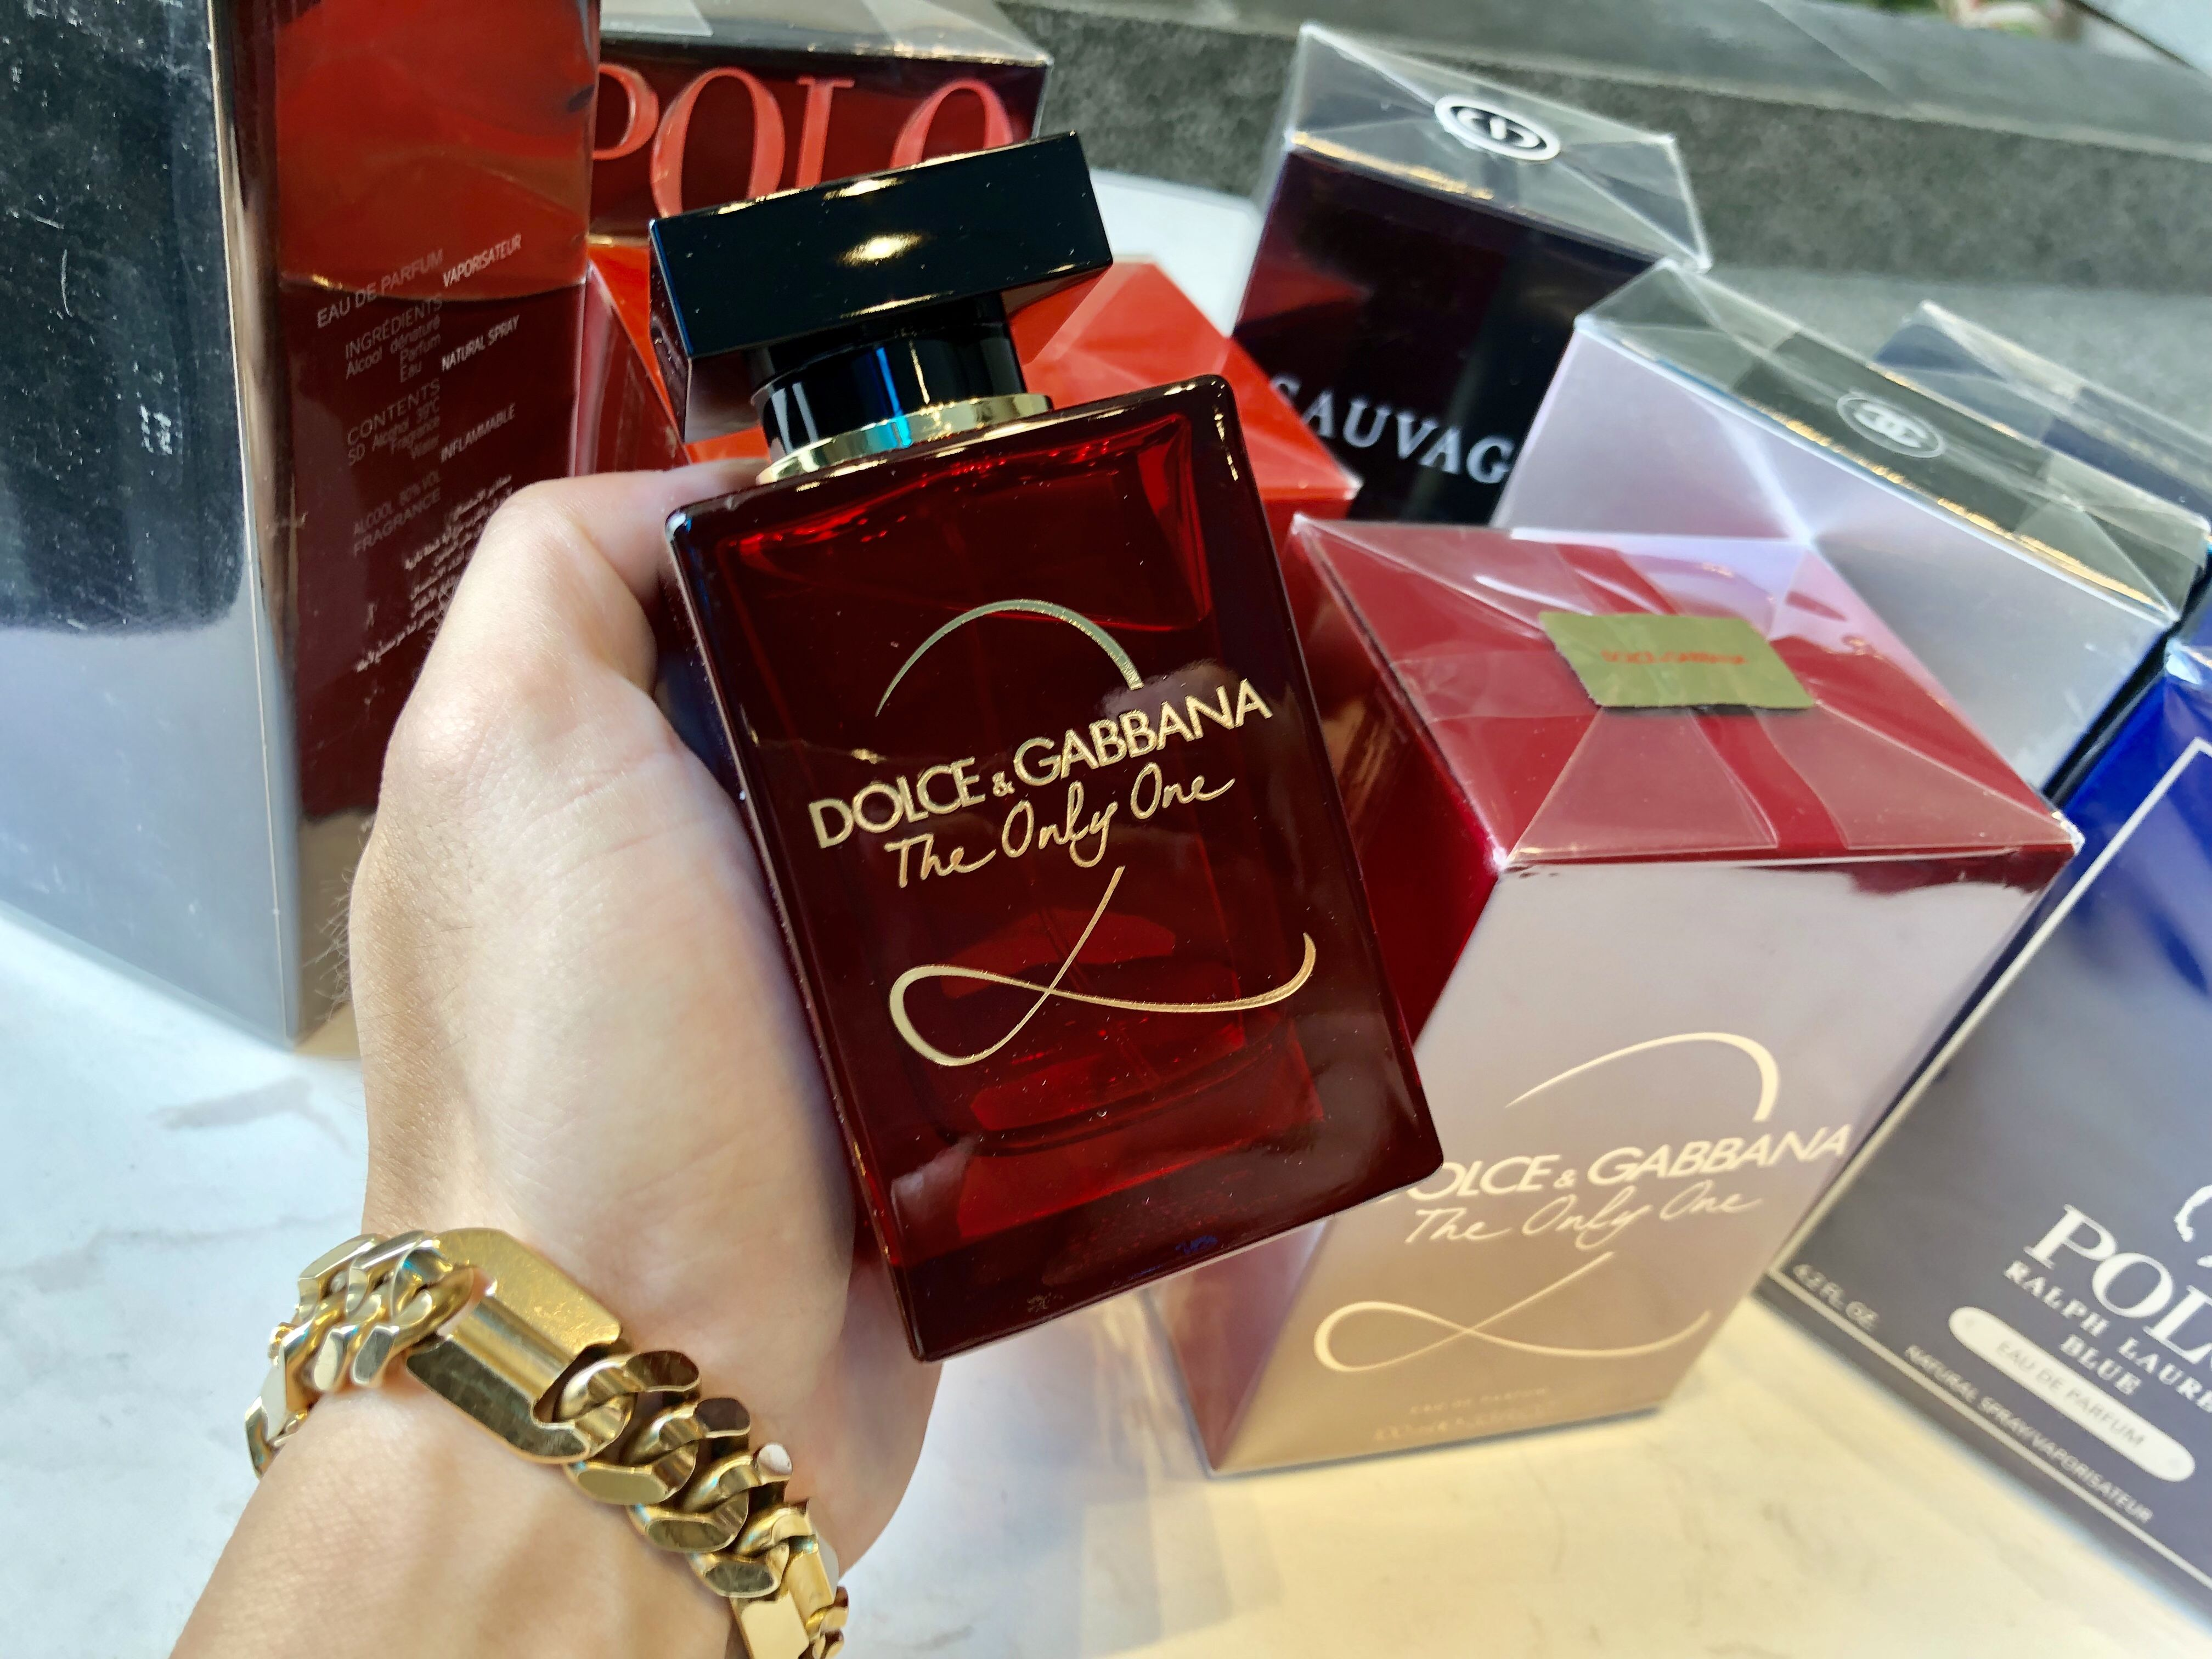 Dolce Gabbana The Only One 2 Perfume Fragrance Perfume Bottles